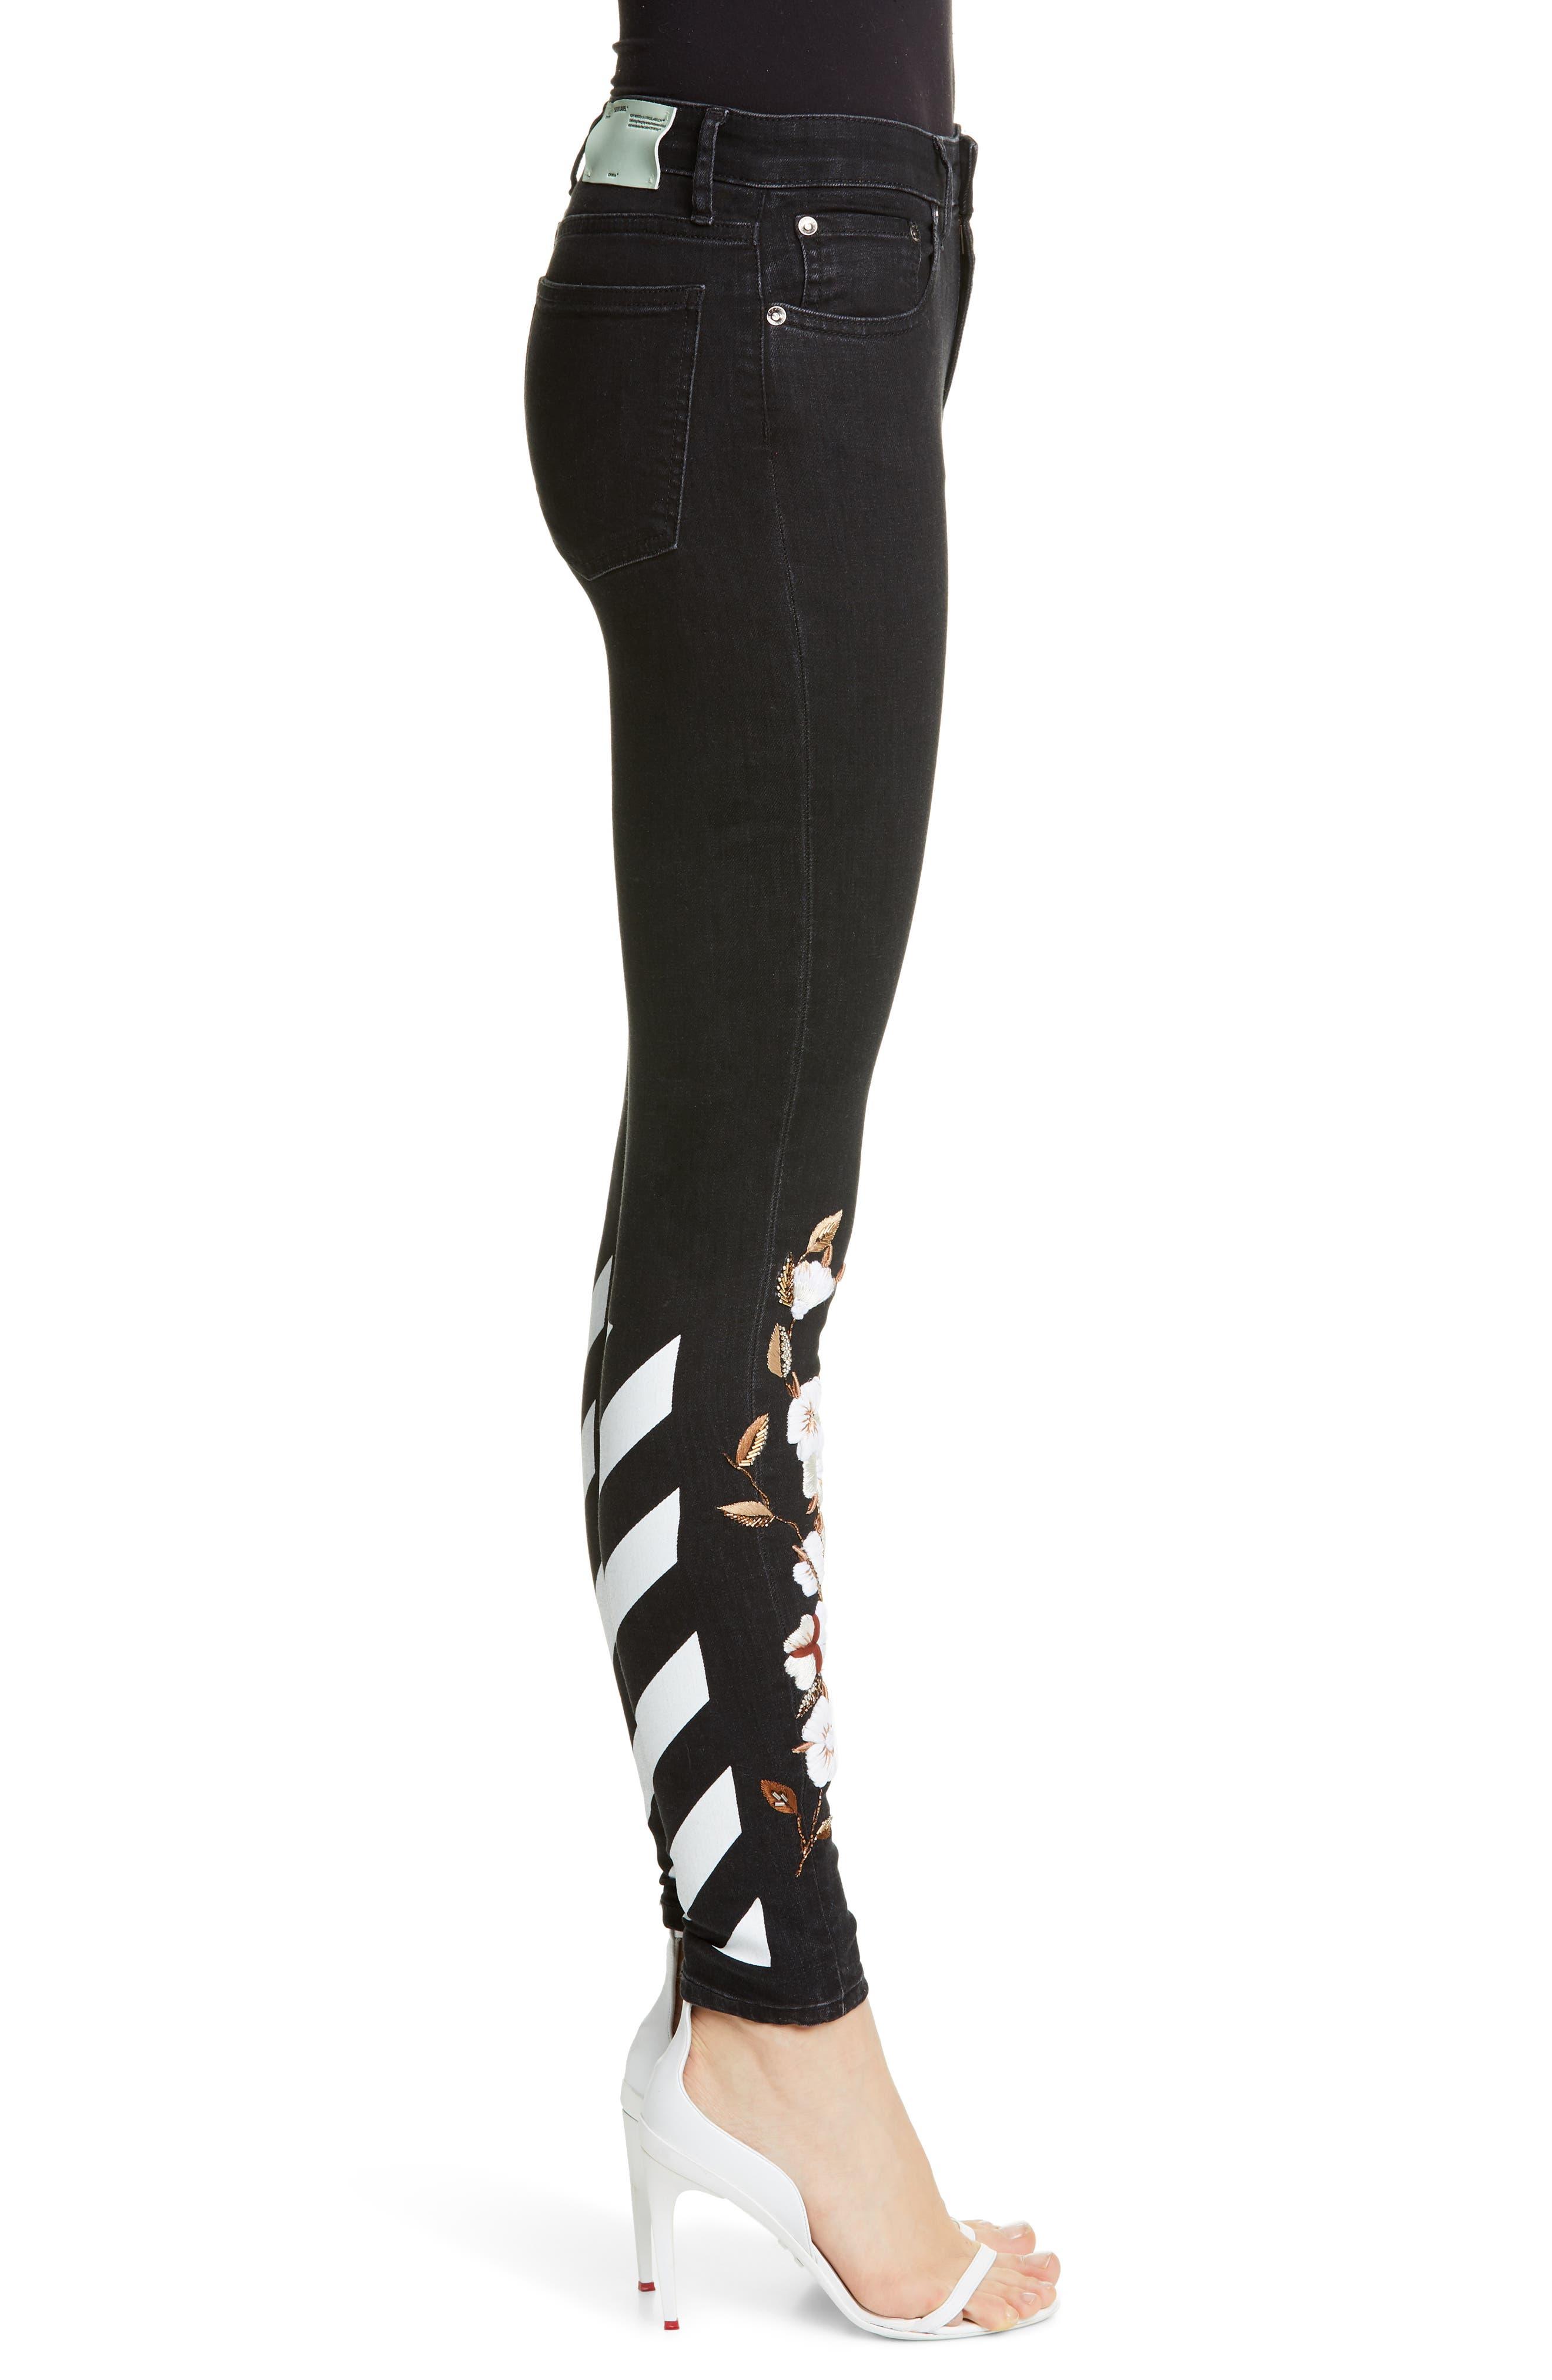 OFF-WHITE, Floral Embroidered Diagonal Stripe Skinny Jeans, Alternate thumbnail 3, color, VINTAGE BLACK